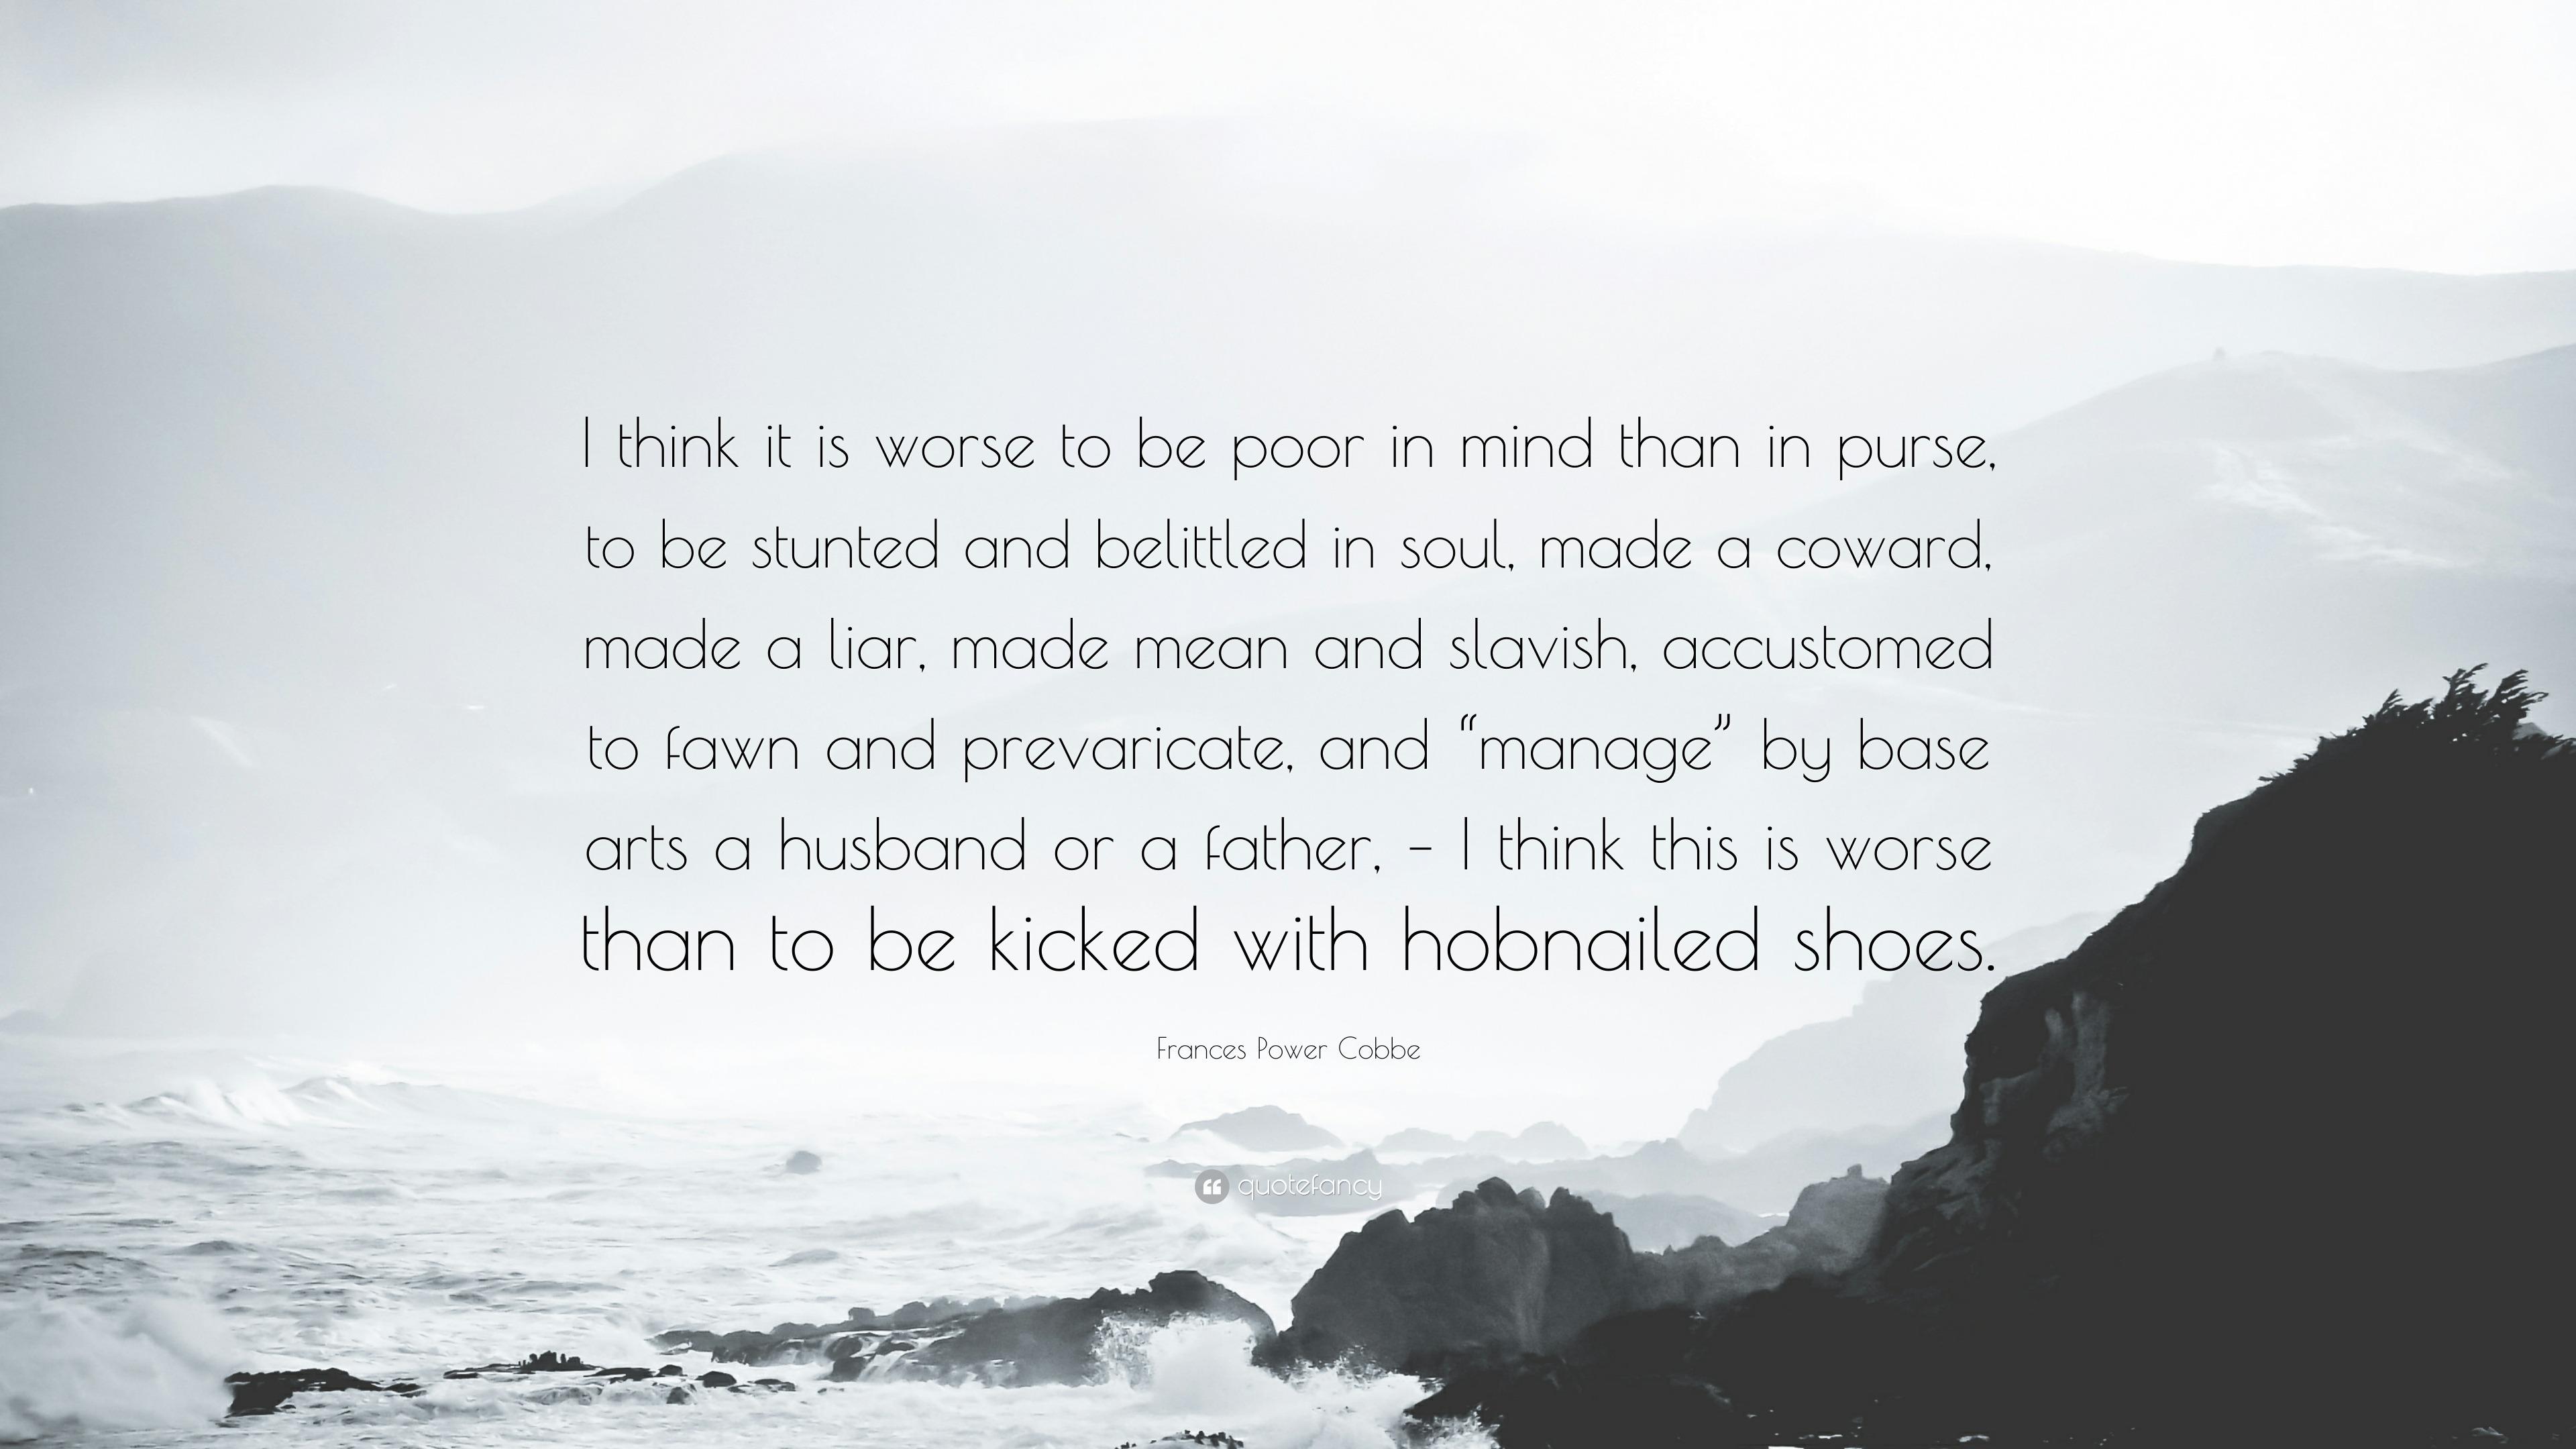 s power cobbe quotes quotefancy